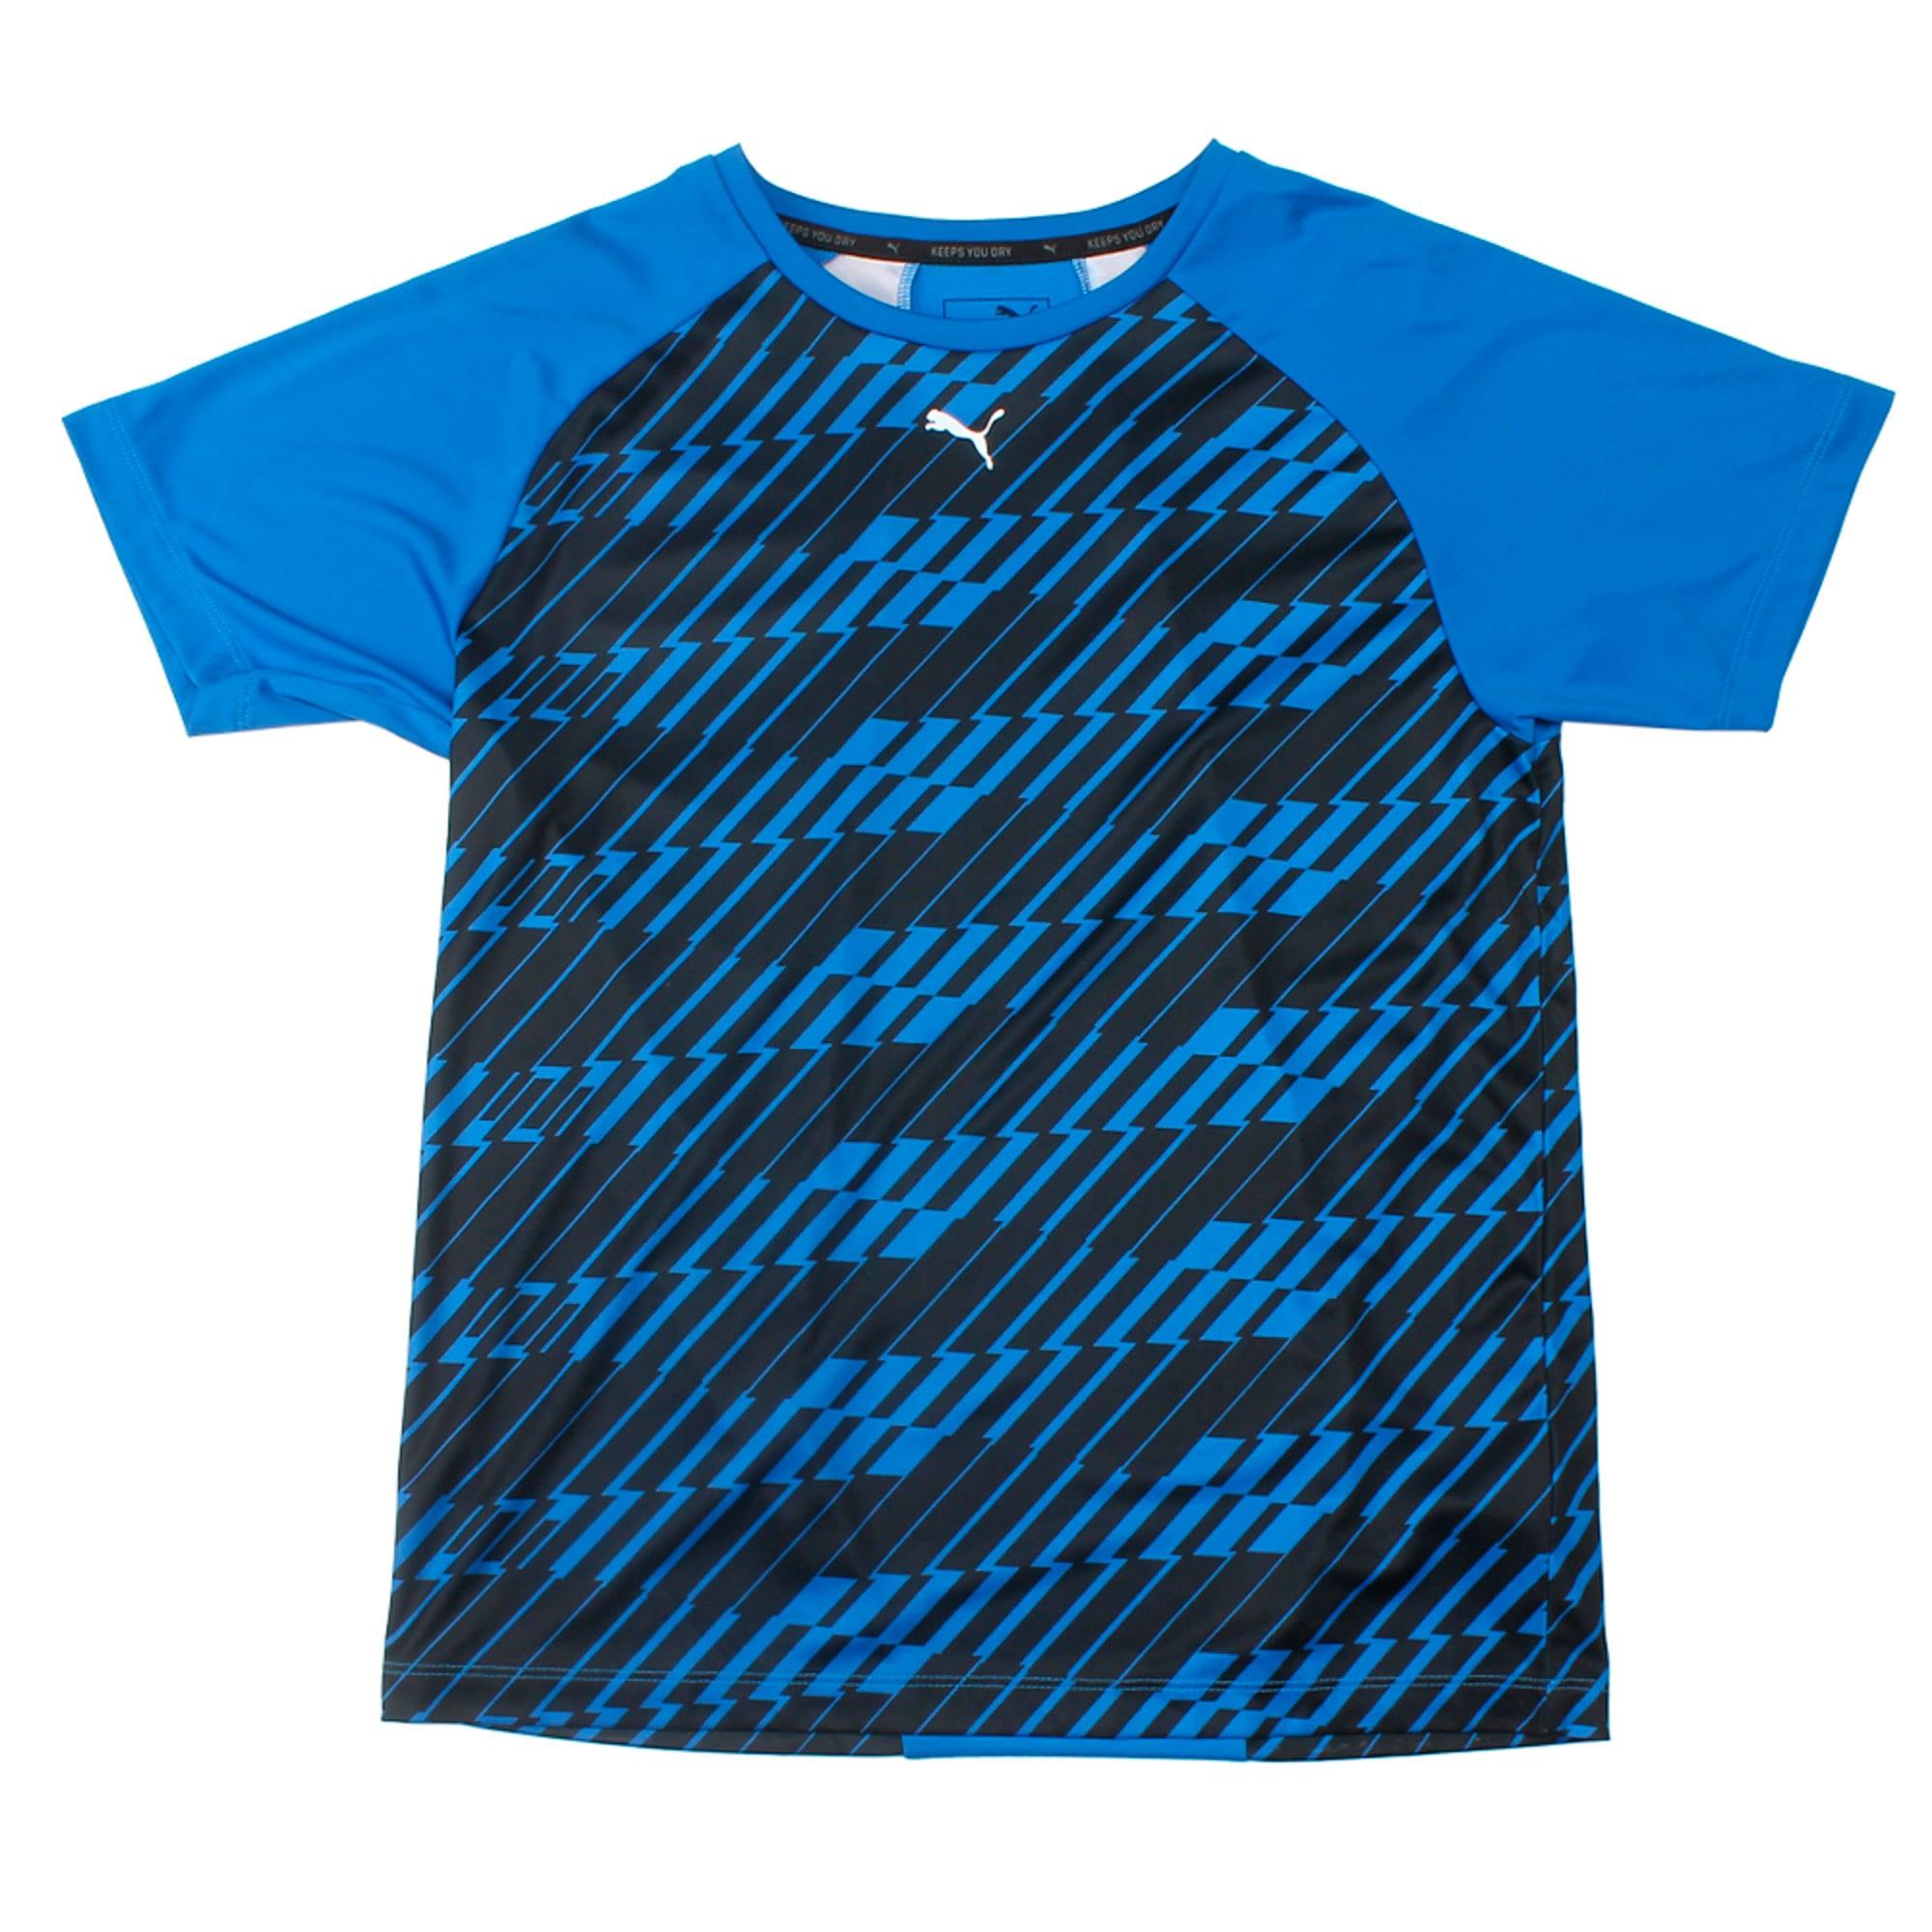 Thumbnail 2 of Gym Graphic AOP Tee B Puma Black, Strong Blue, medium-IND